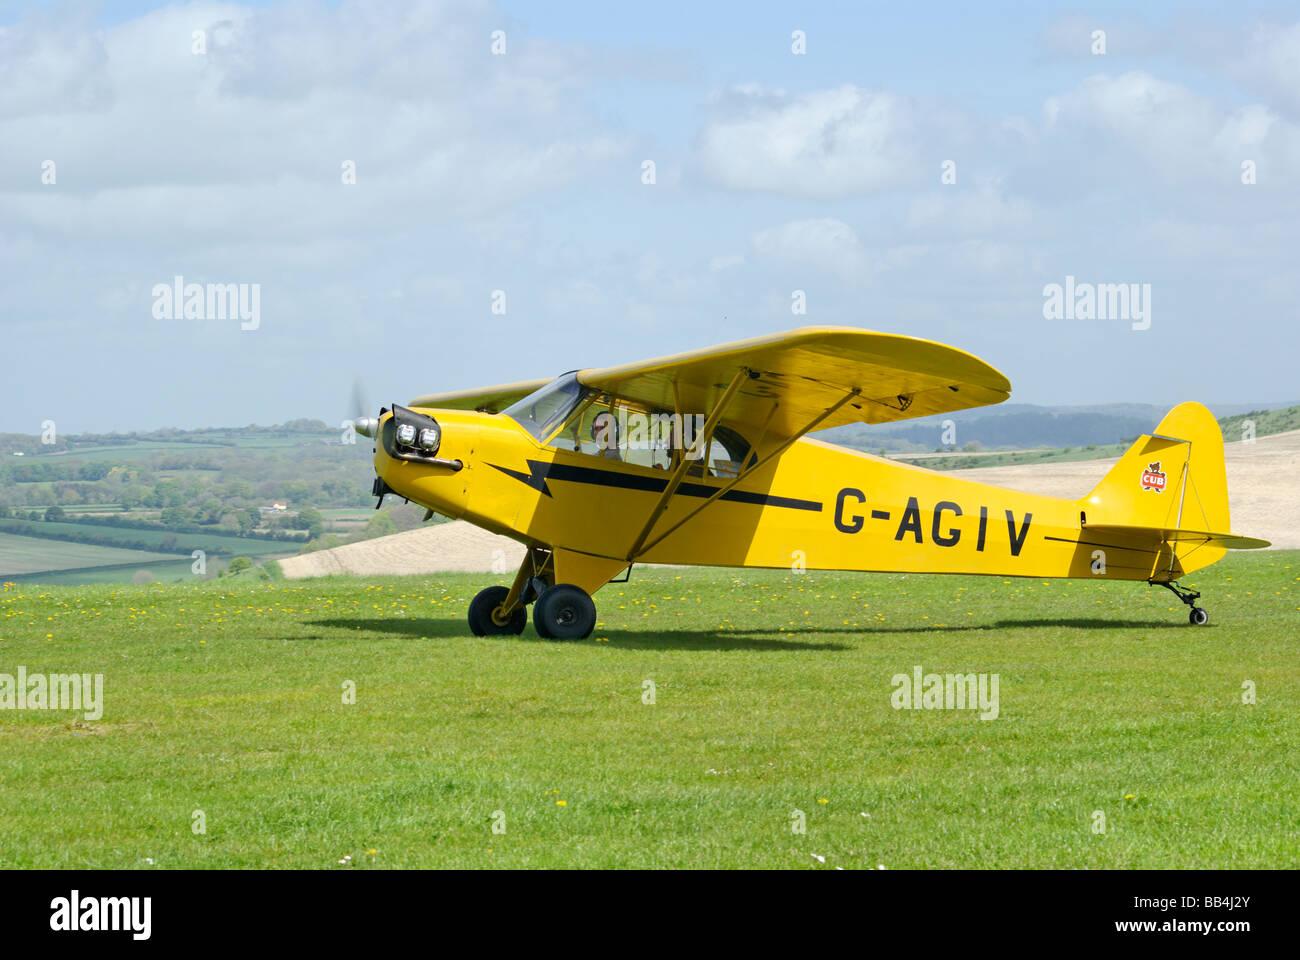 Piper Cub aircraft - Stock Image